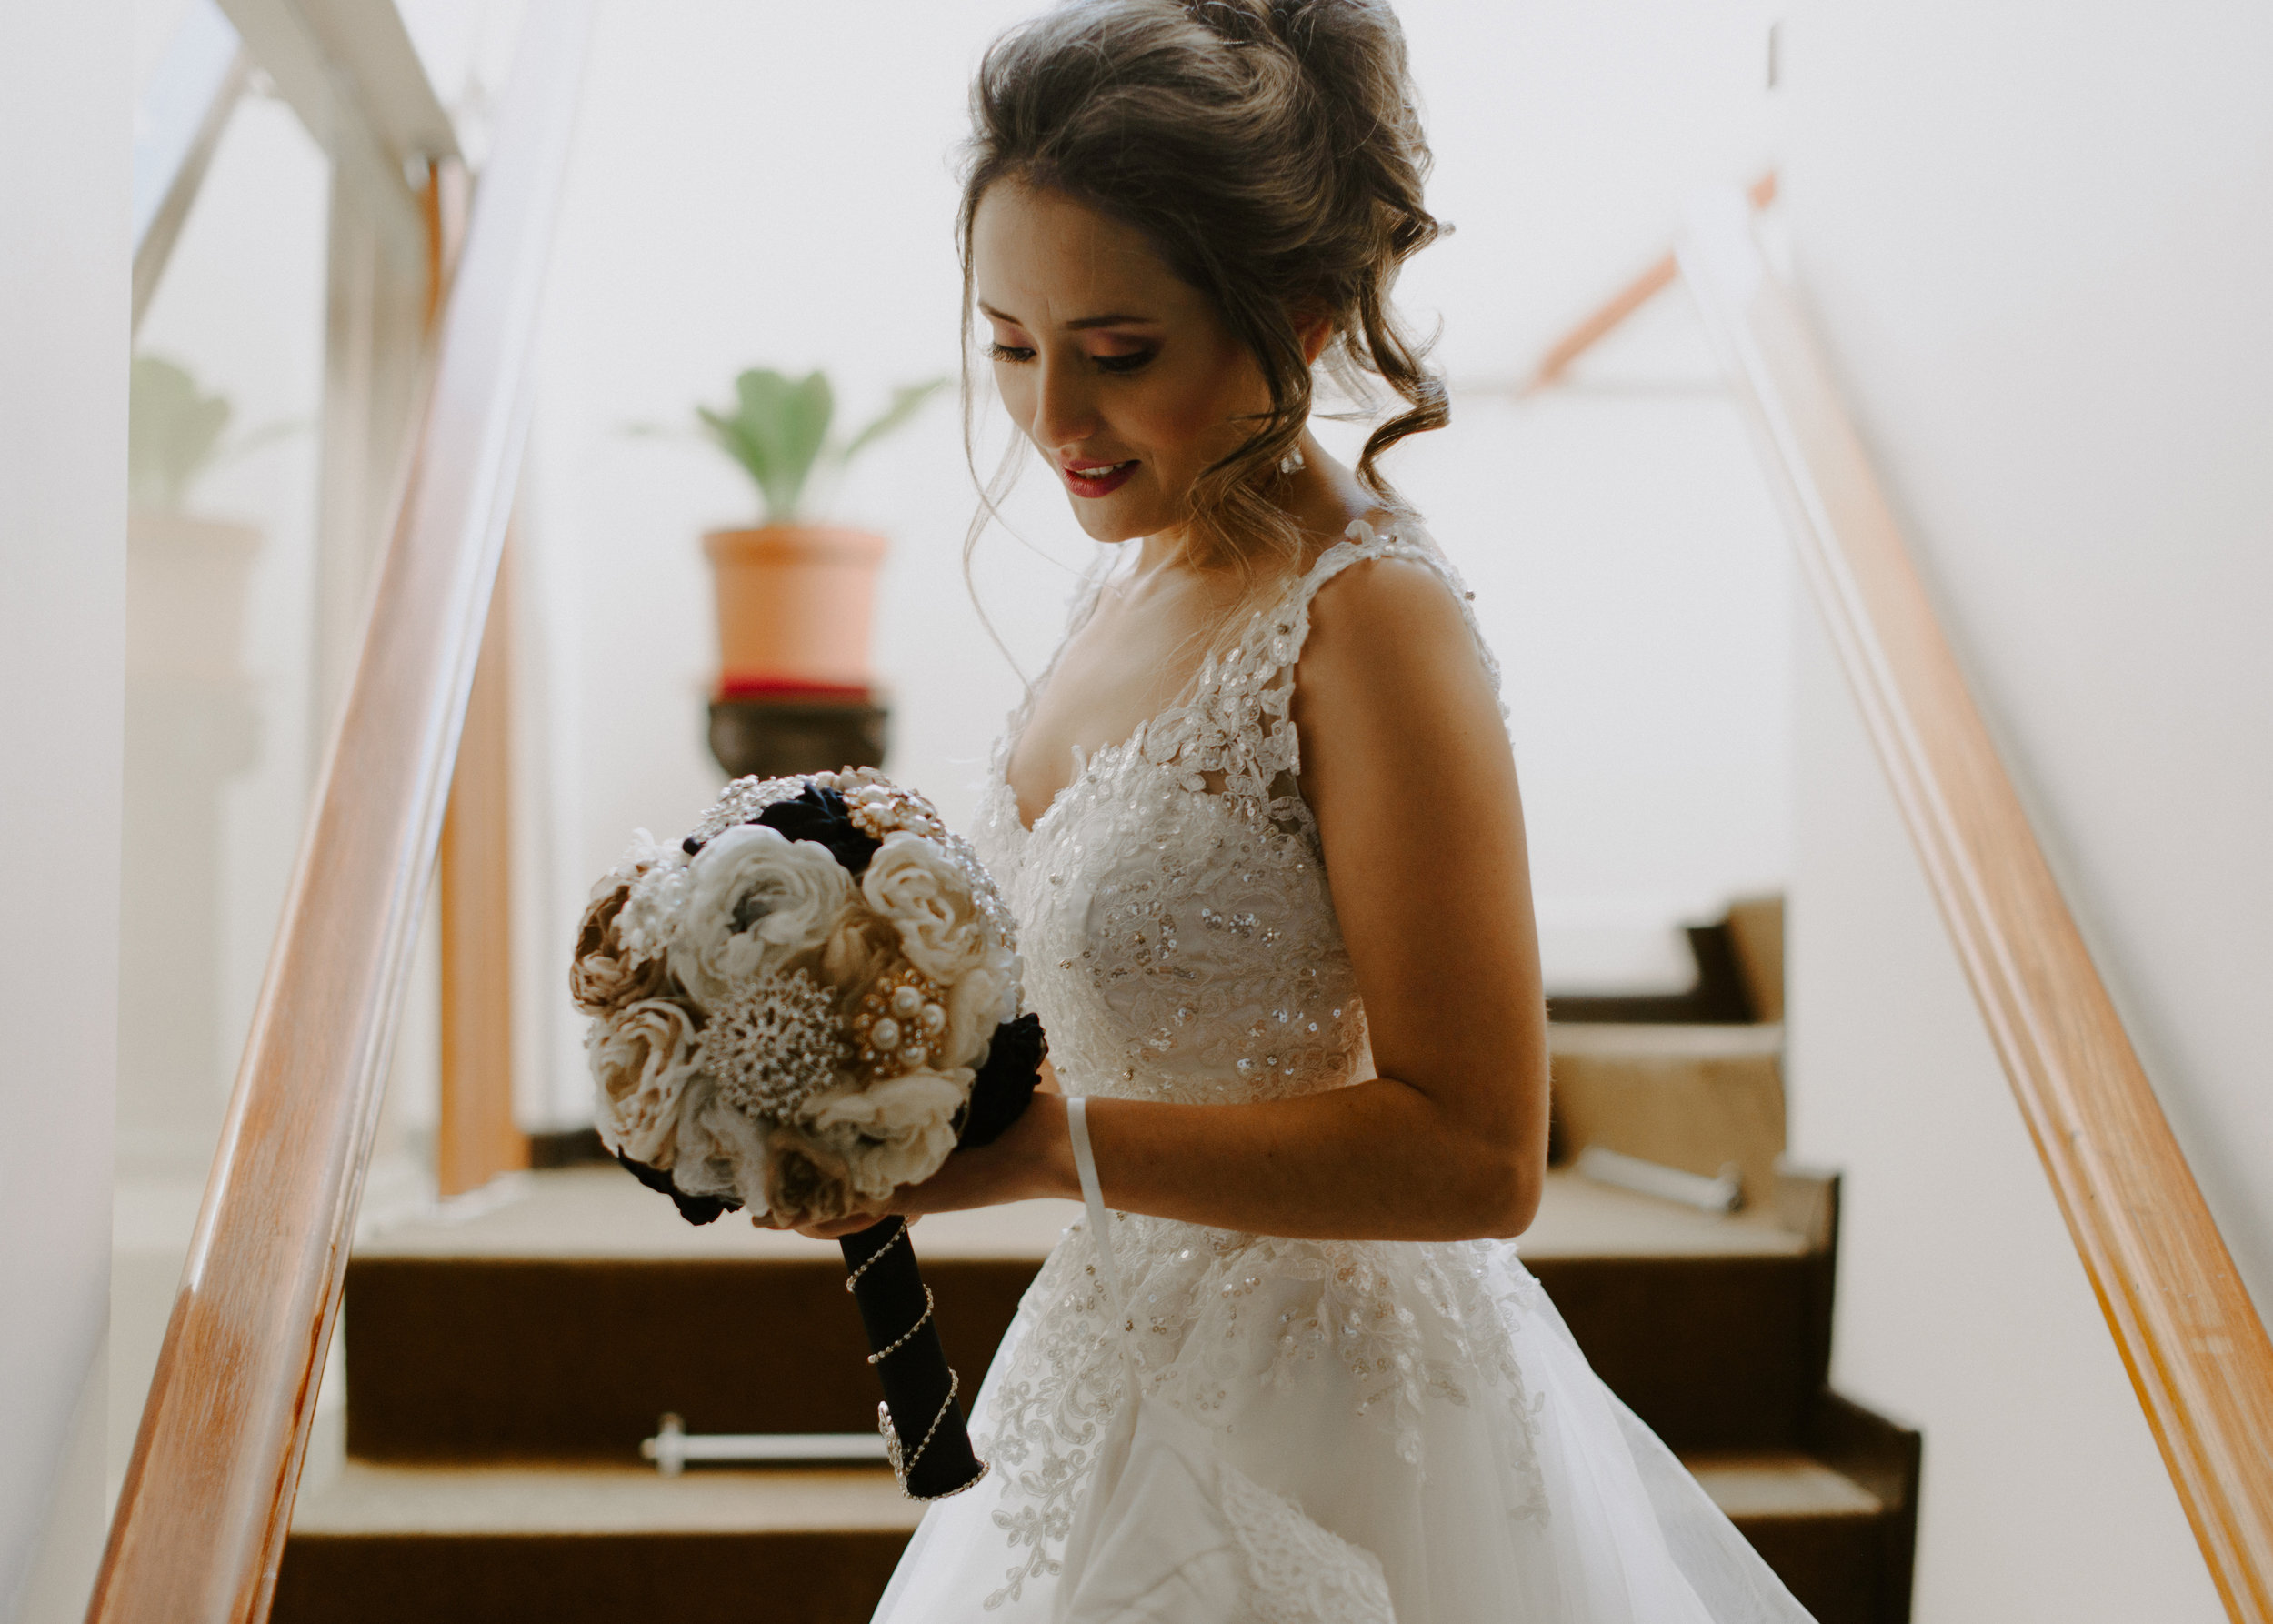 fotografo de boda peru - marzo photography.jpg